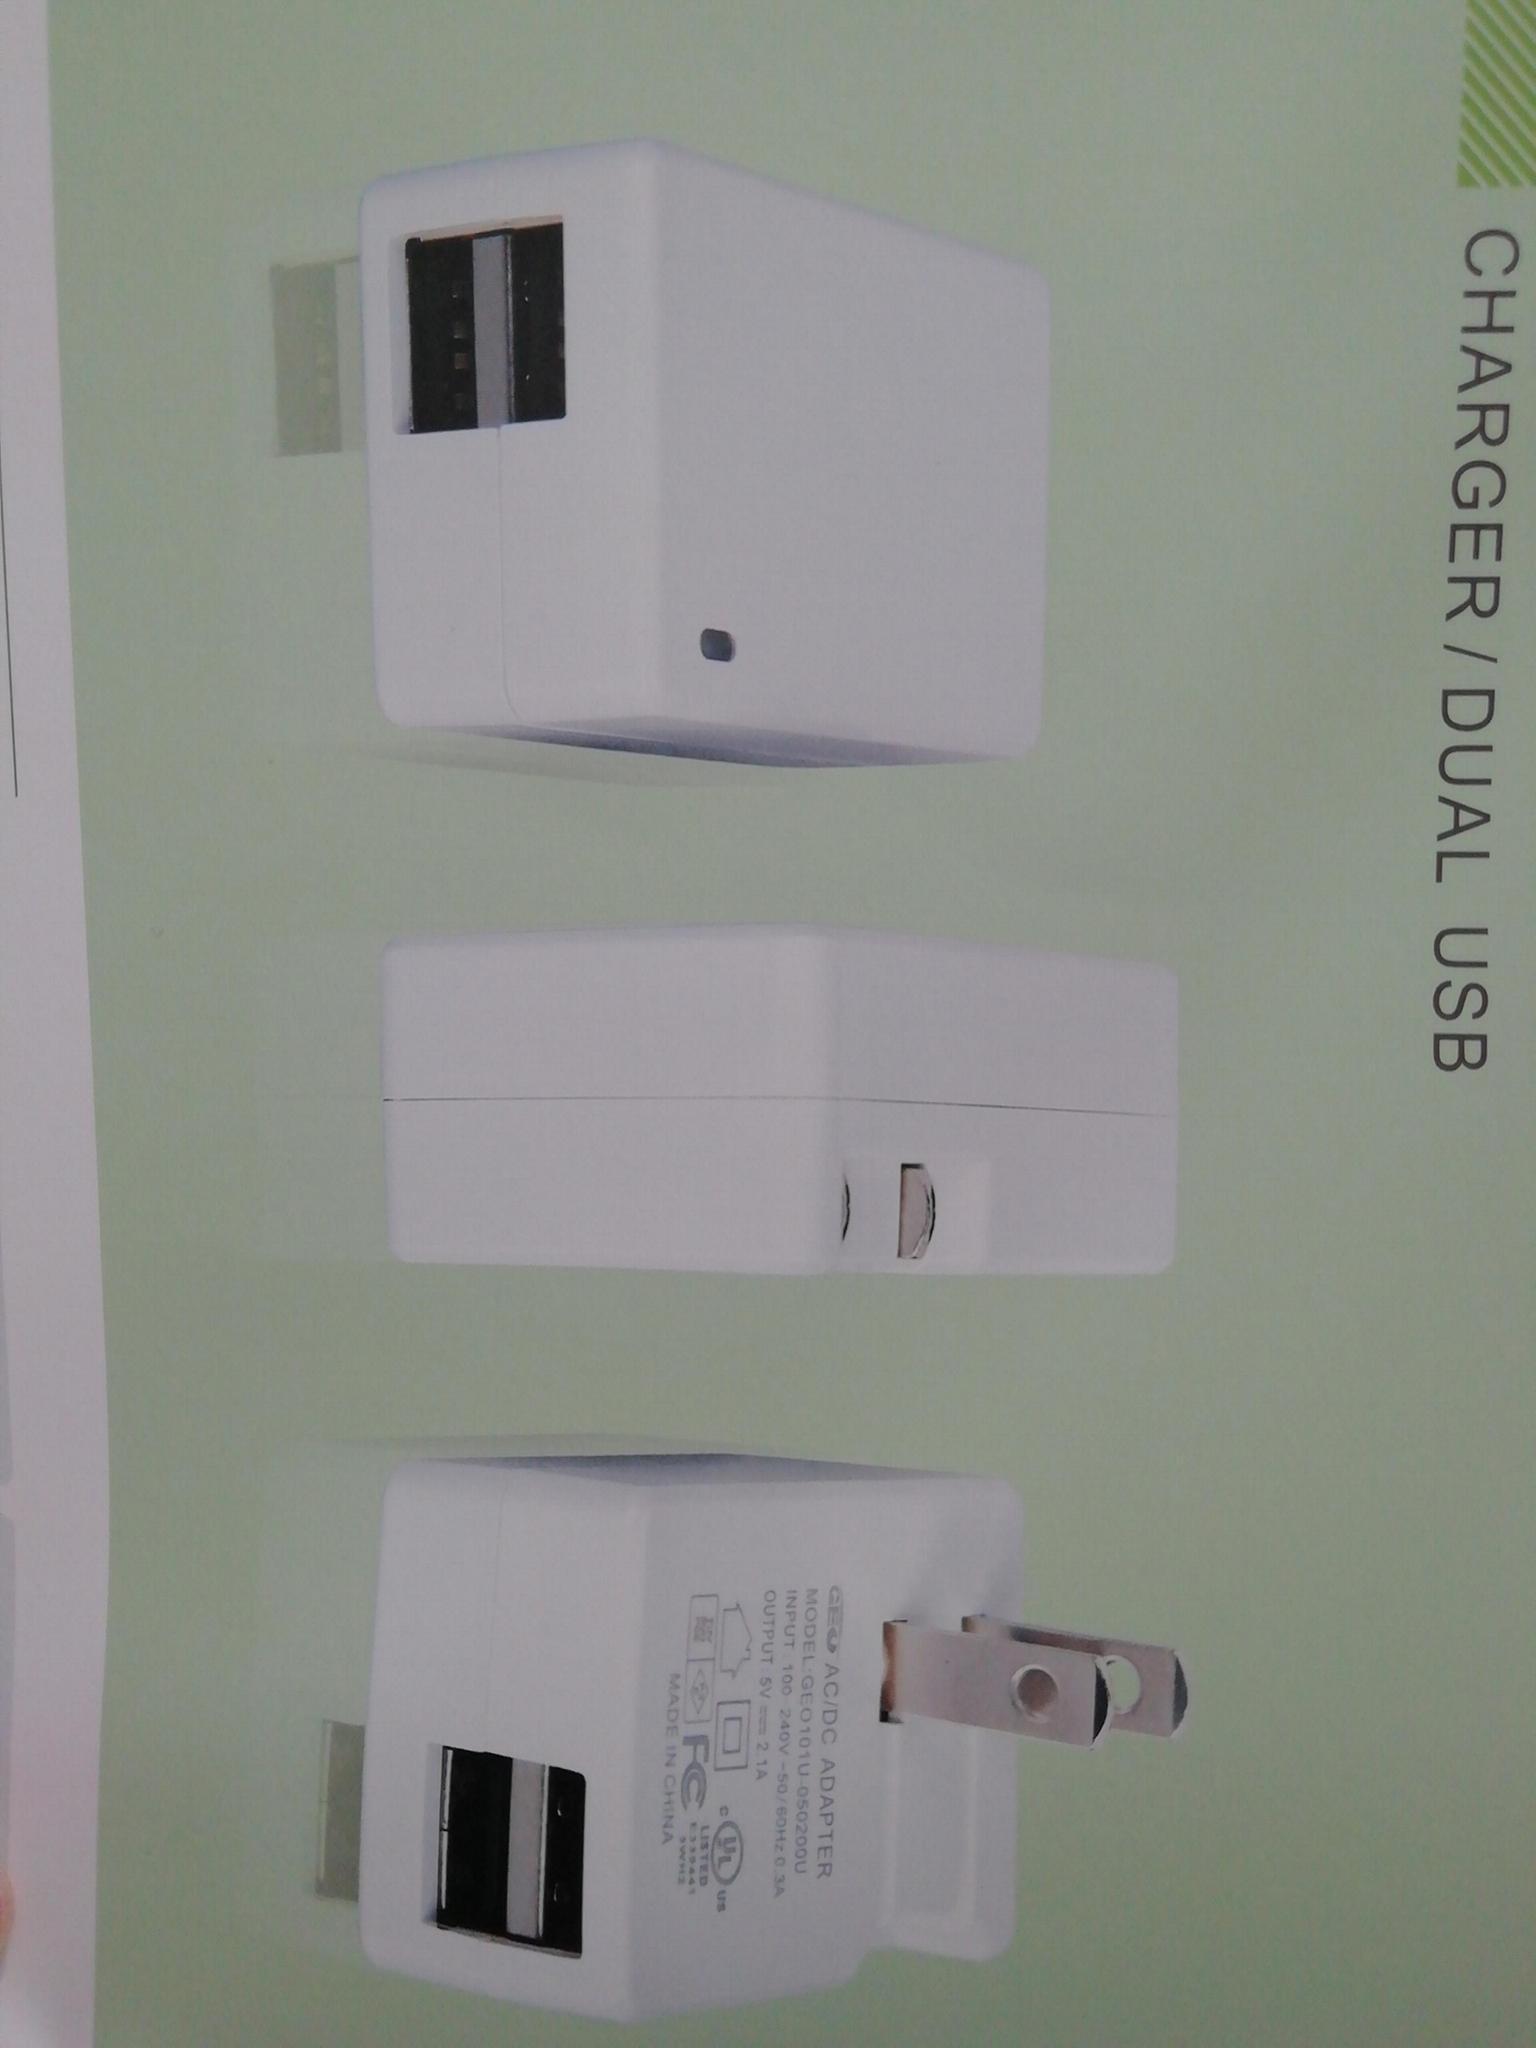 5V2.1A 雙USB充電器 型號GEO101U-050200U 2